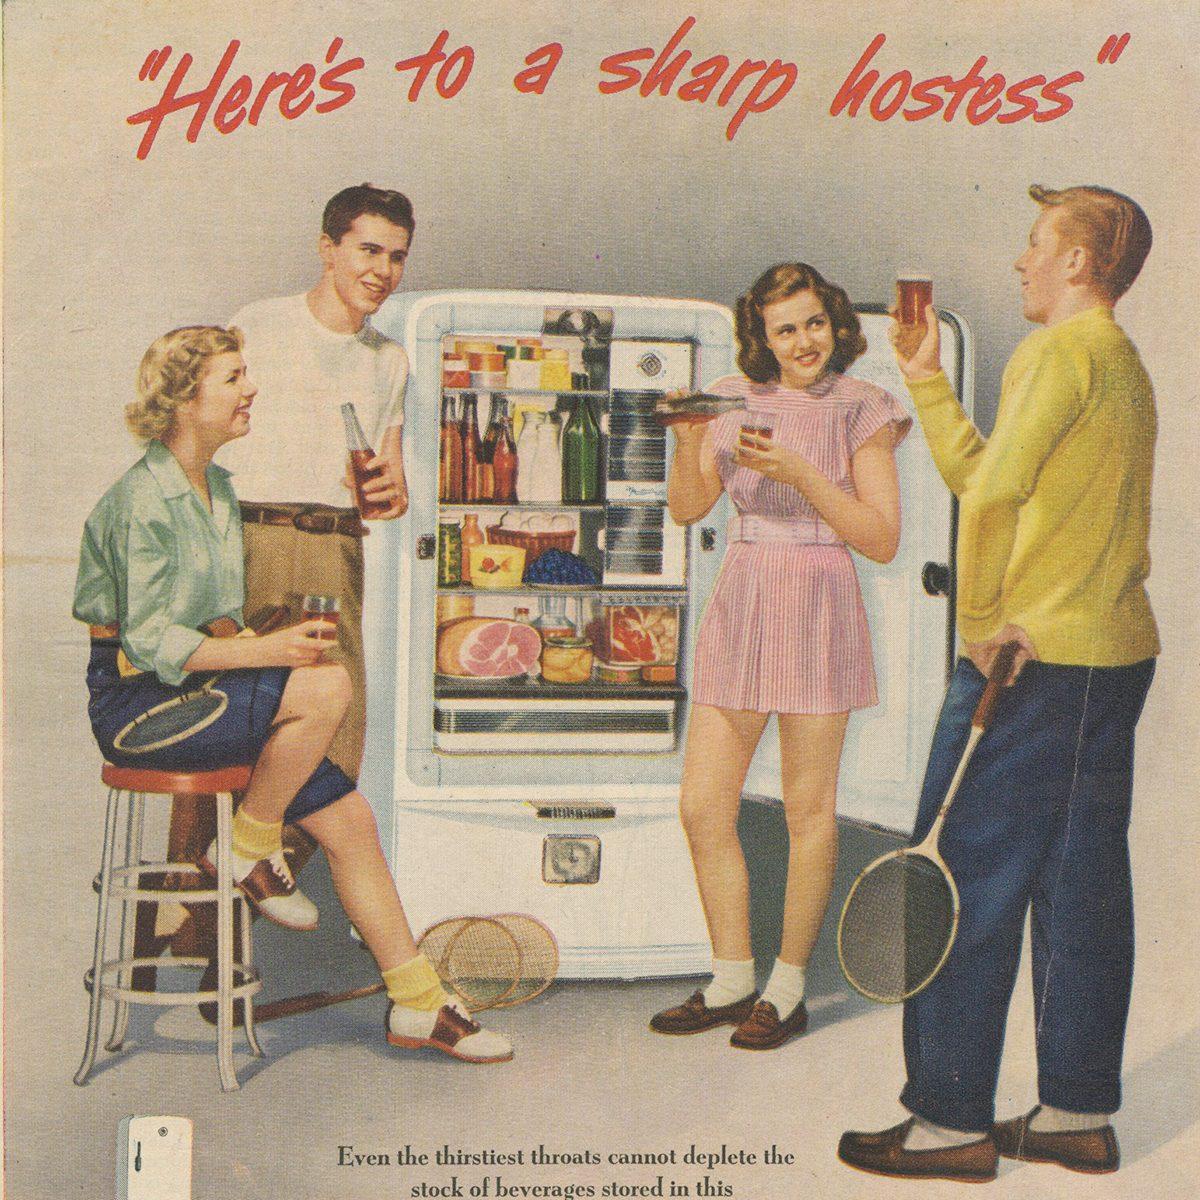 Norge Refrigerator ad